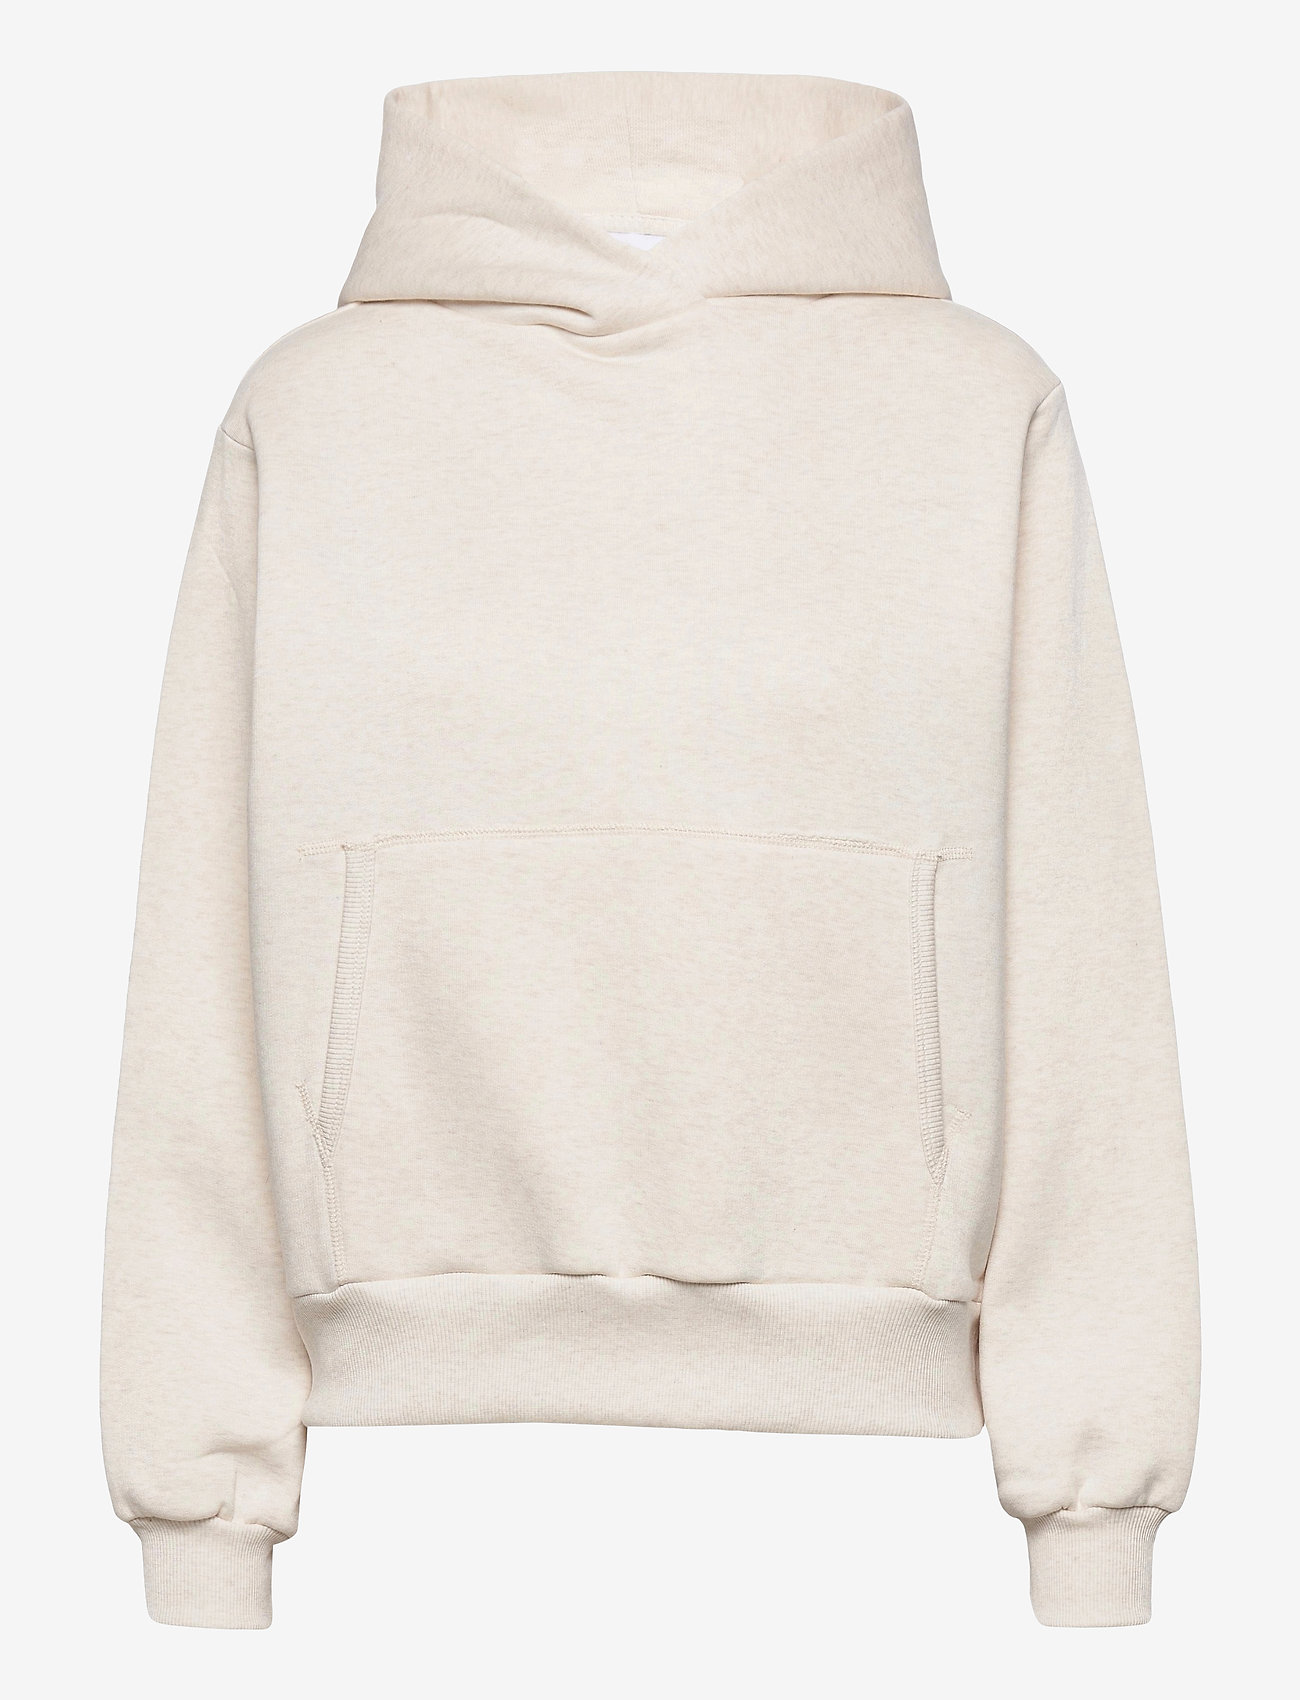 RODEBJER - RODEBJER MONOGRAM - sweatshirts & hættetrøjer - puffy white - 0